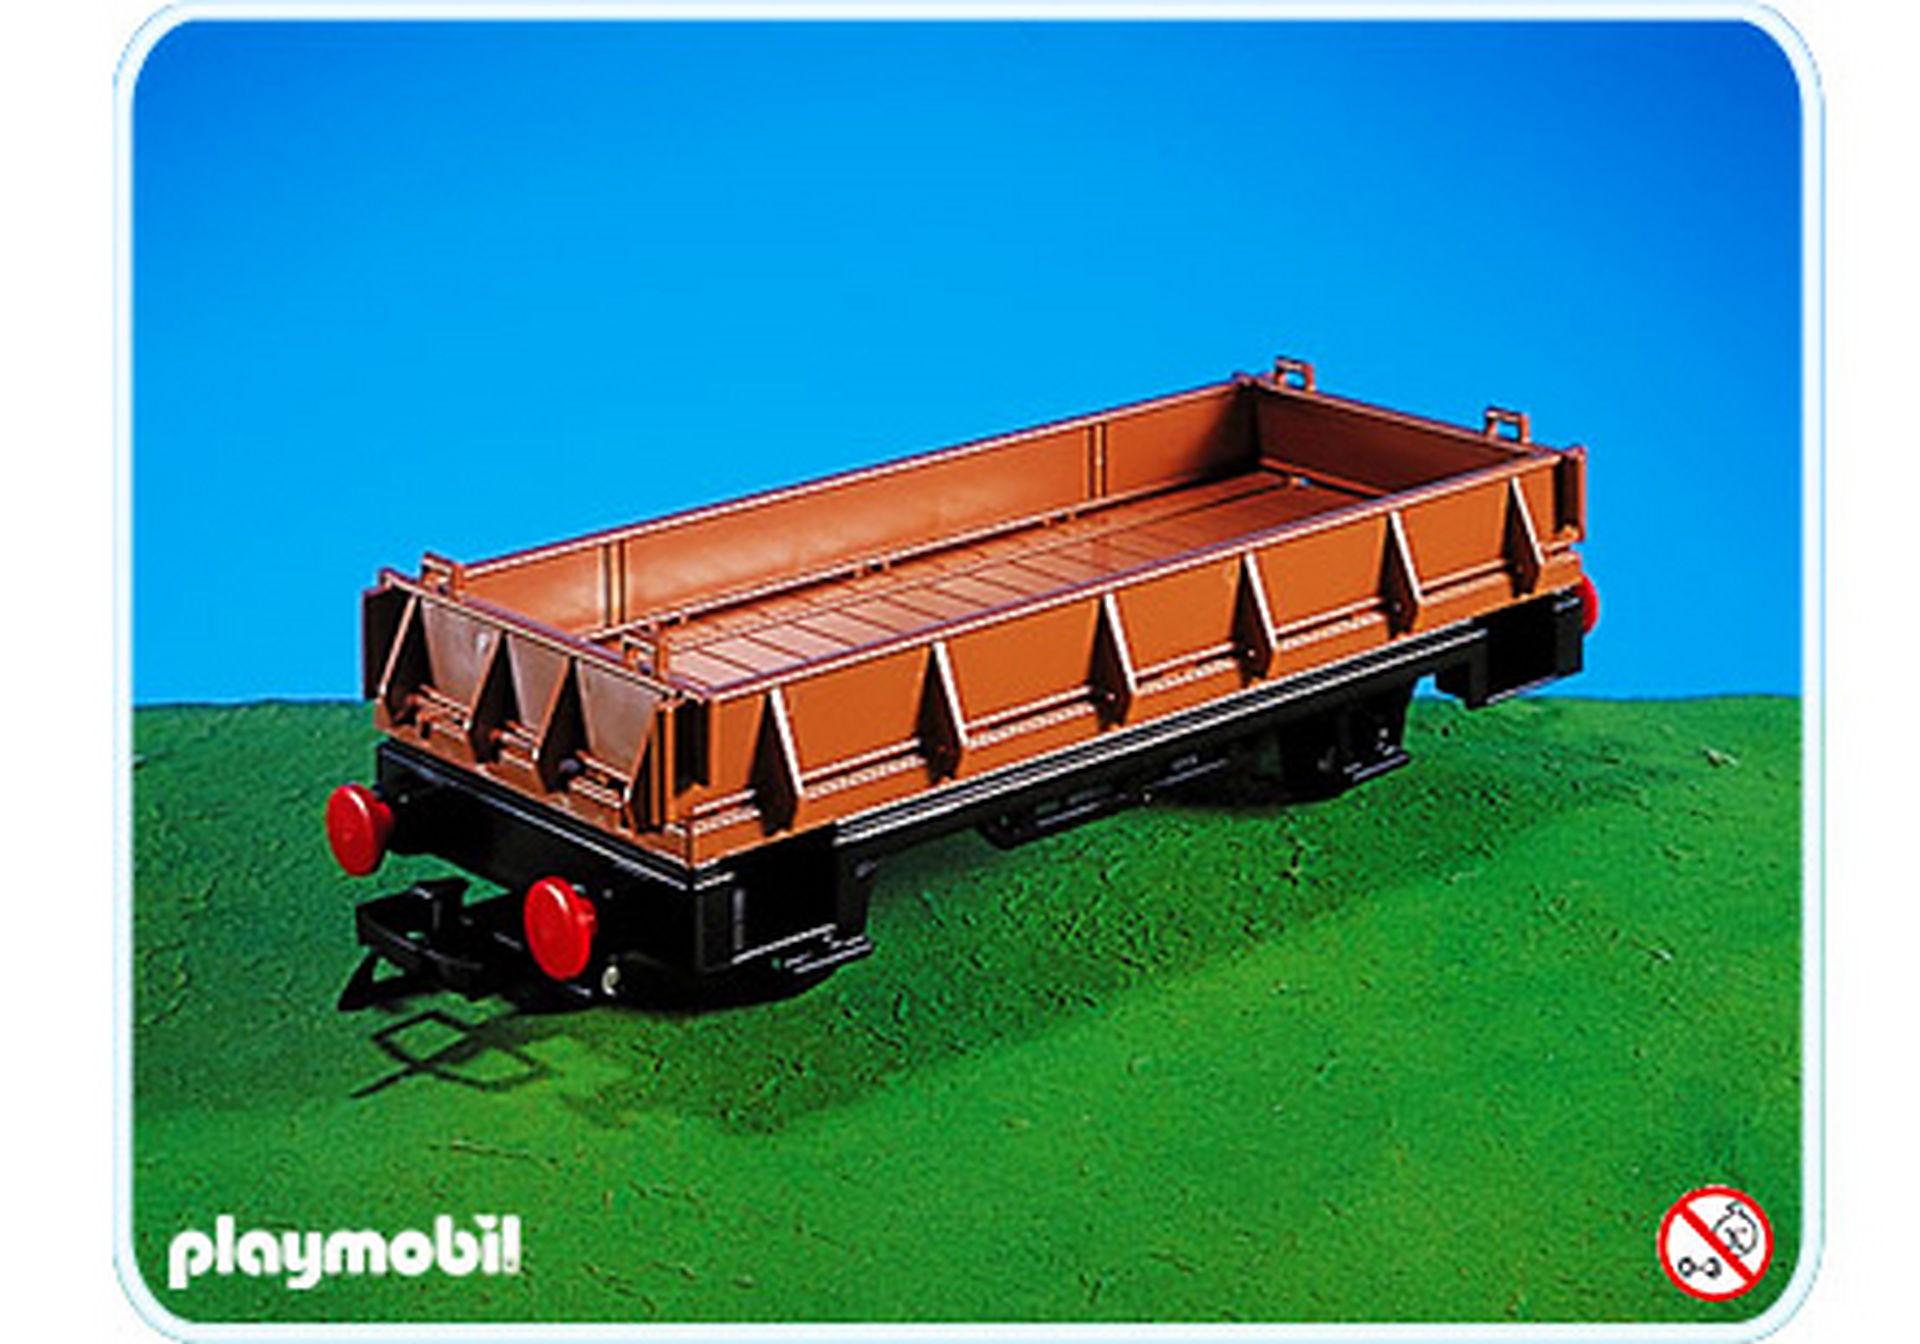 4104-A Niederbordwagen zoom image1